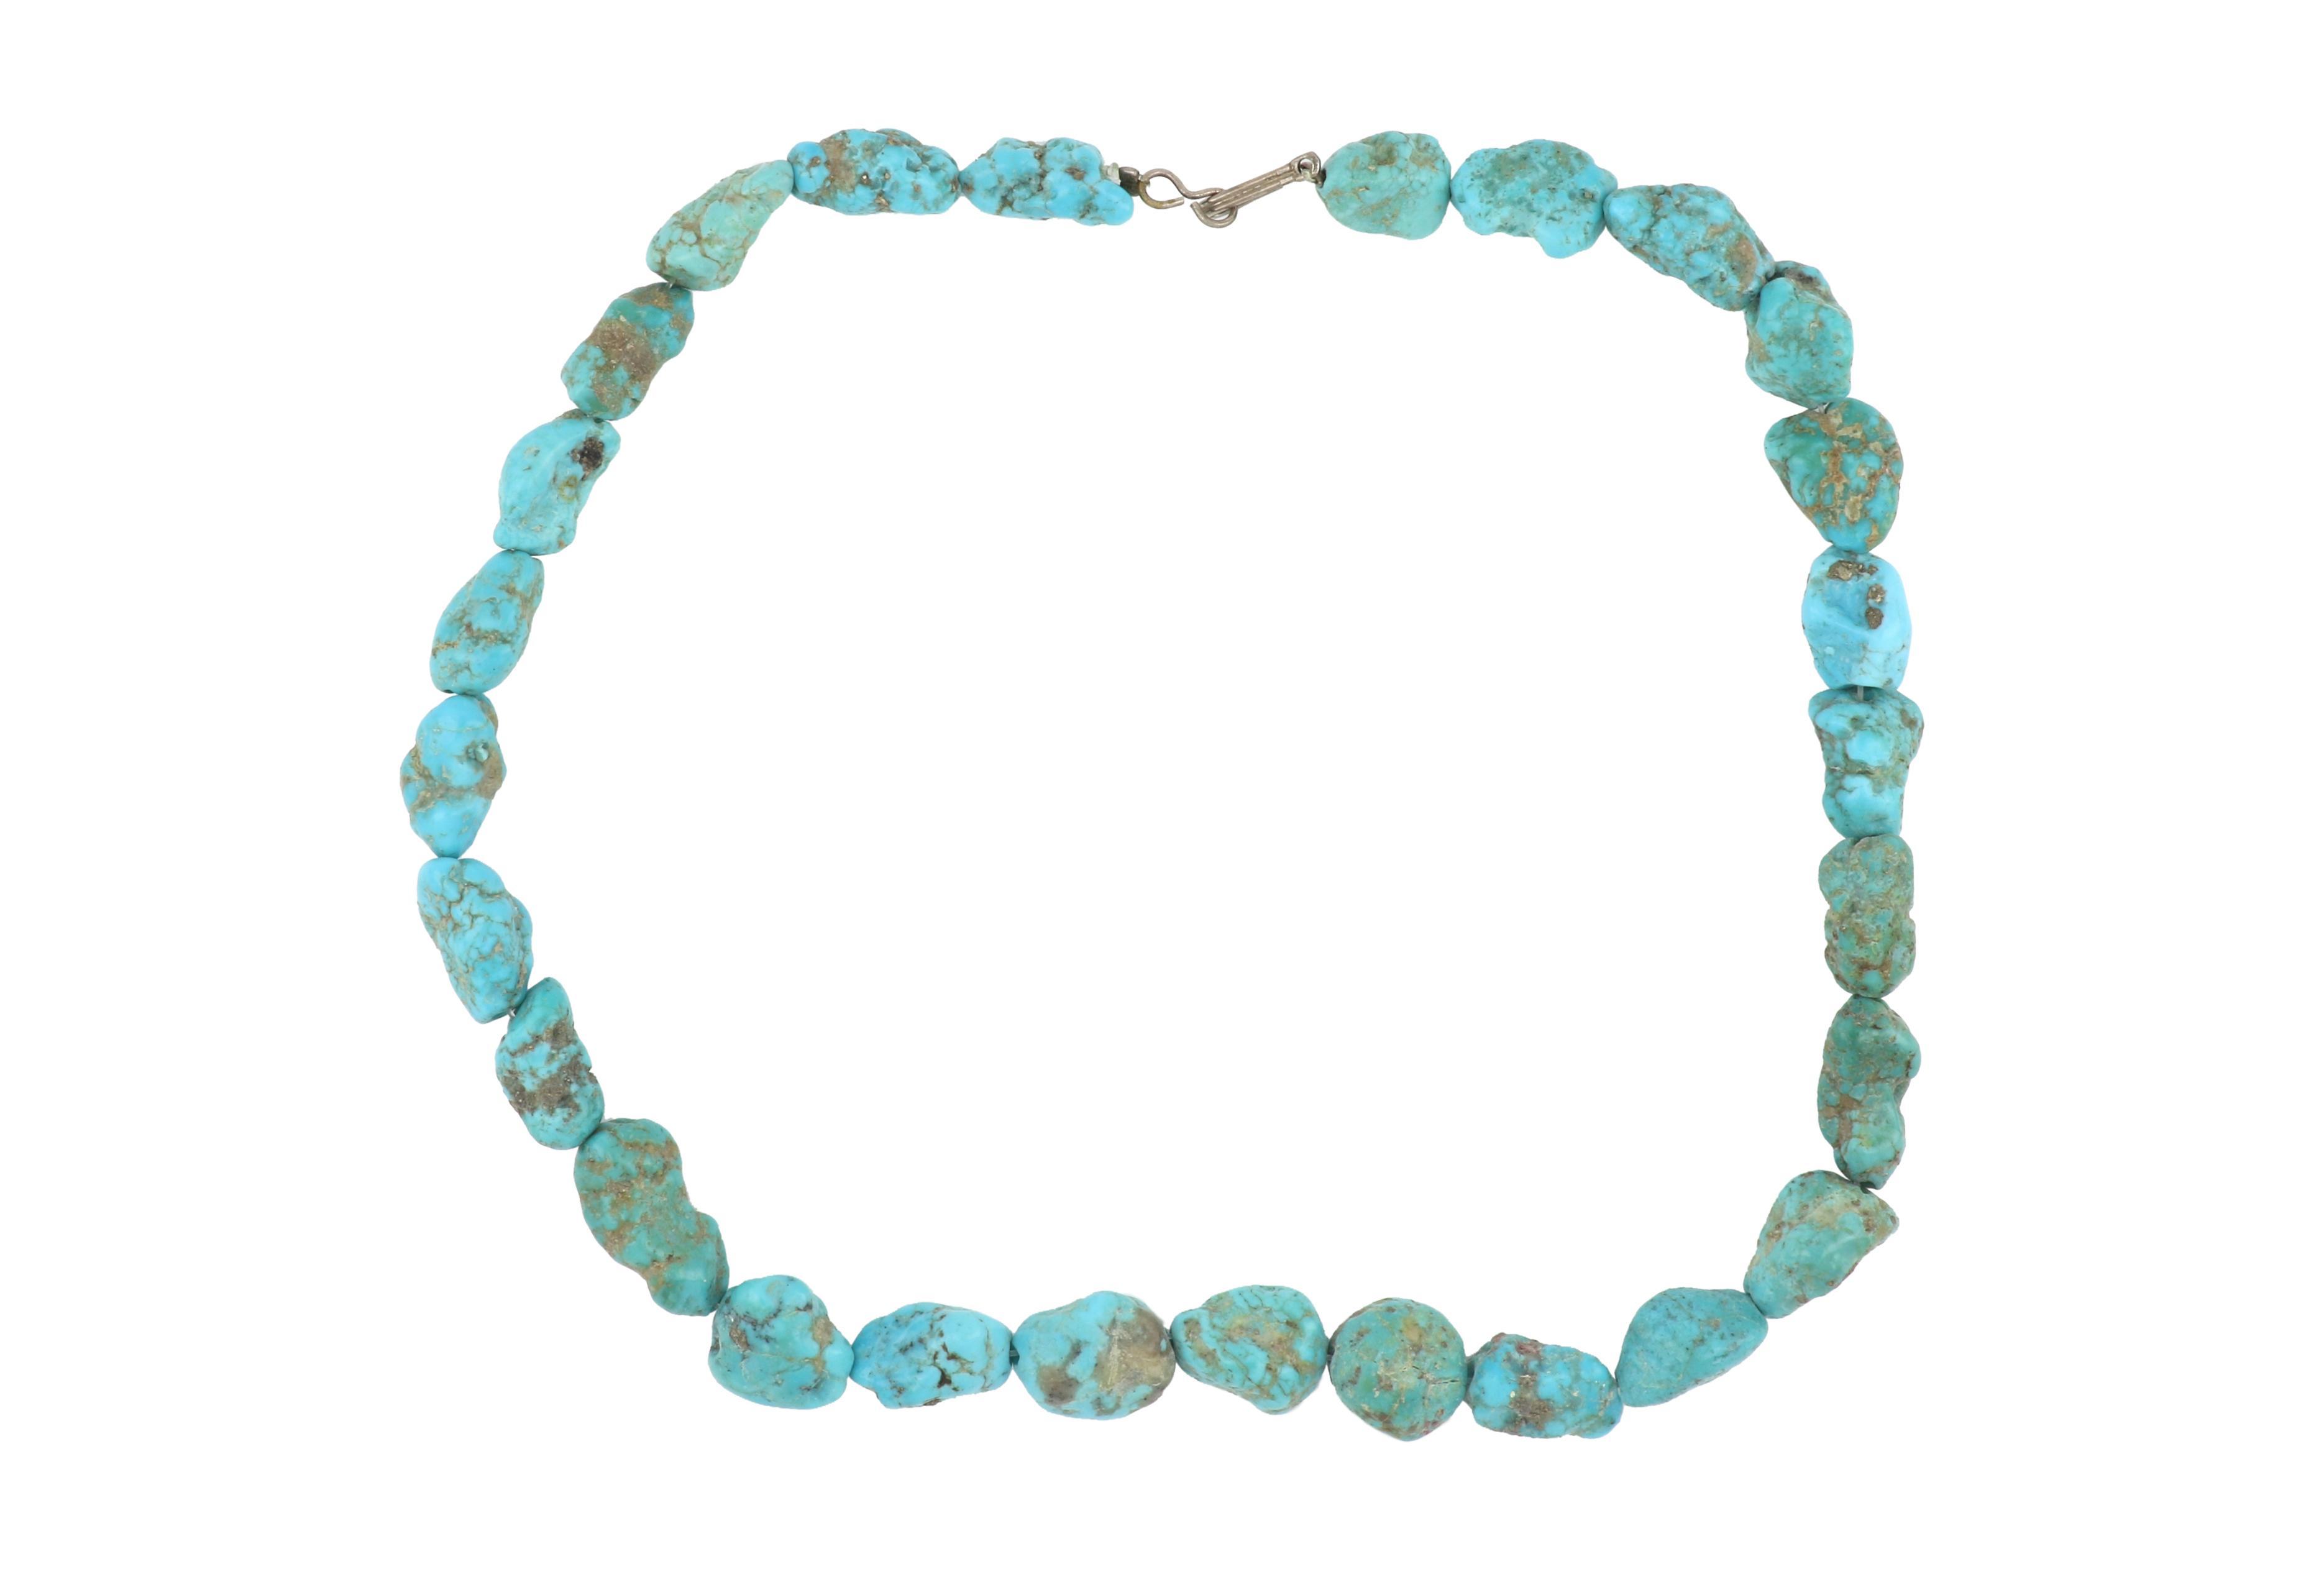 Strand of freeform turquoise beads